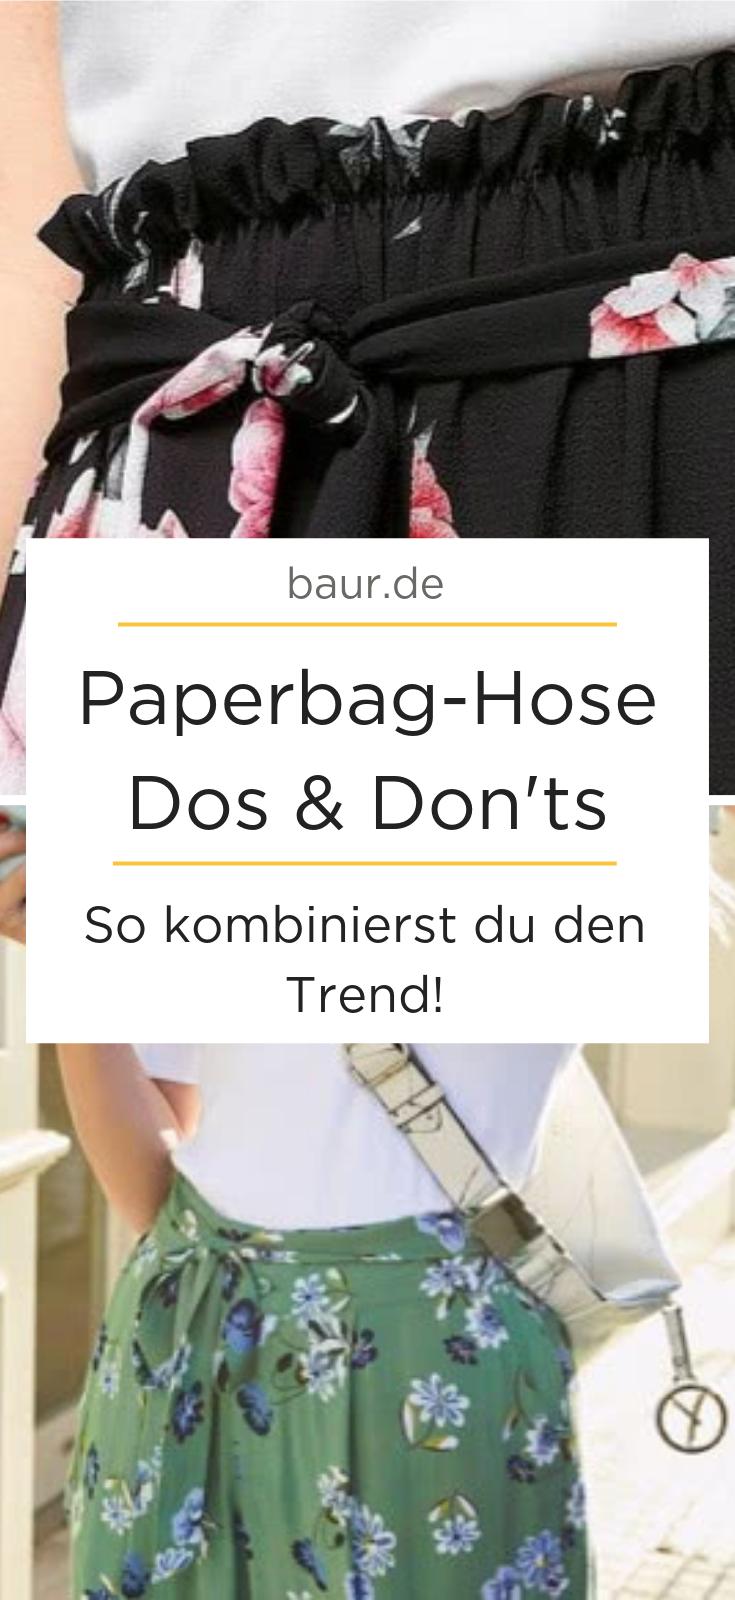 Paperbag Hose Was Ist Das